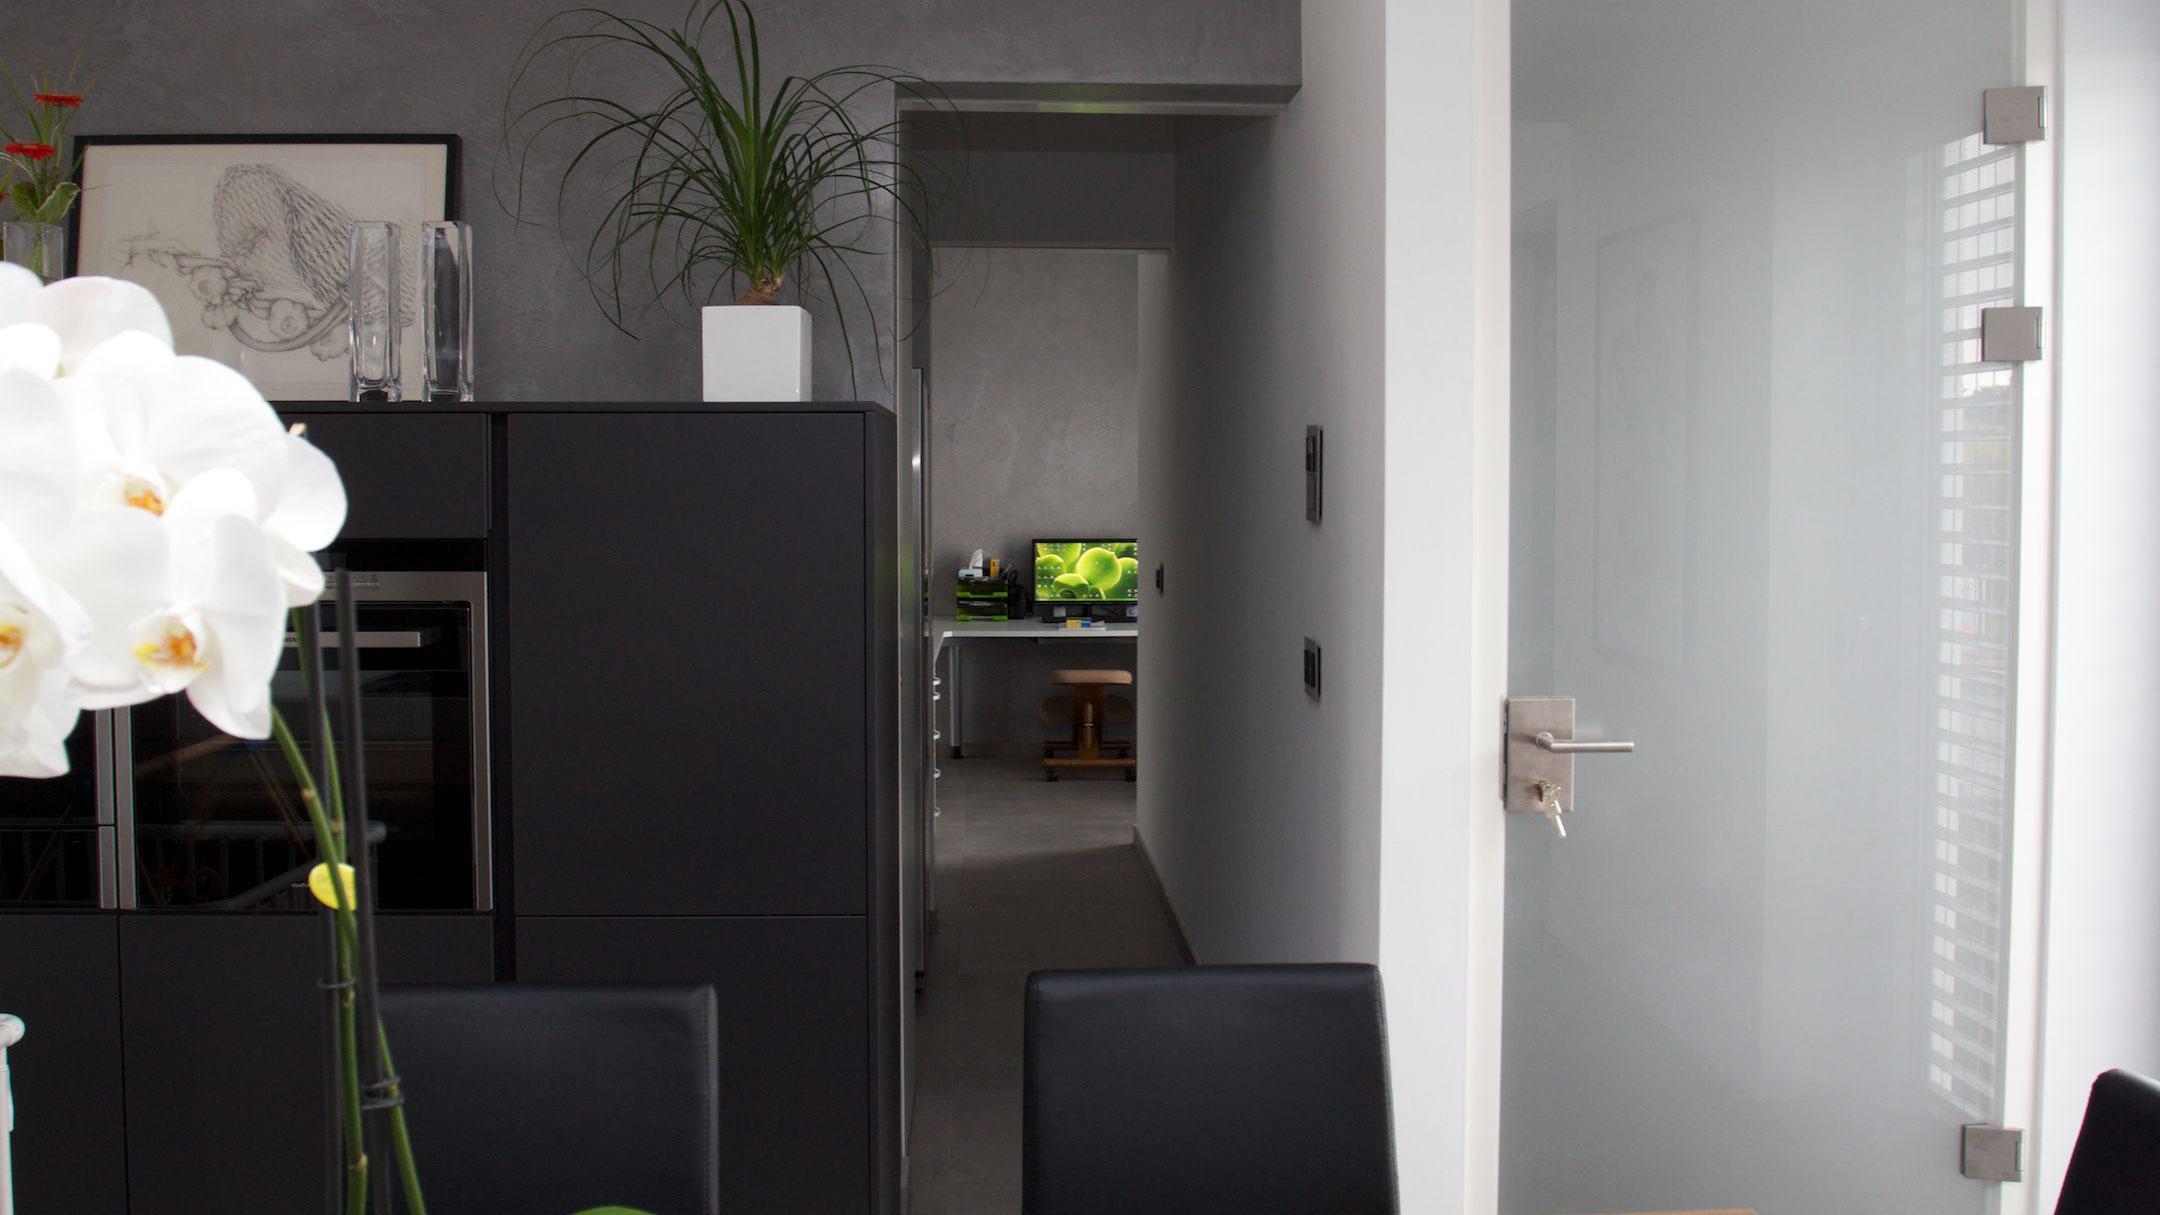 geplante und gebaute projekte planungsb ro ingenieurb ro. Black Bedroom Furniture Sets. Home Design Ideas